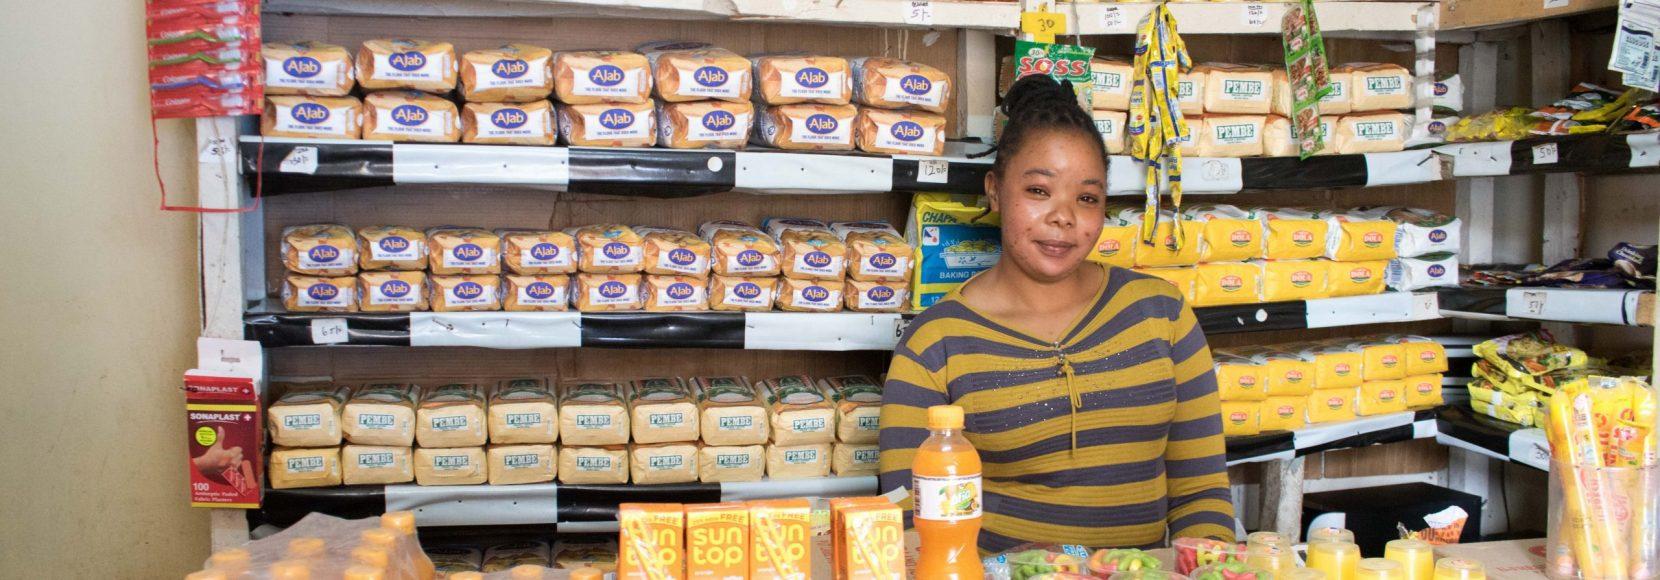 Jacinta Musyoka stands in her micro-retail shop in Nairobi, Kenya